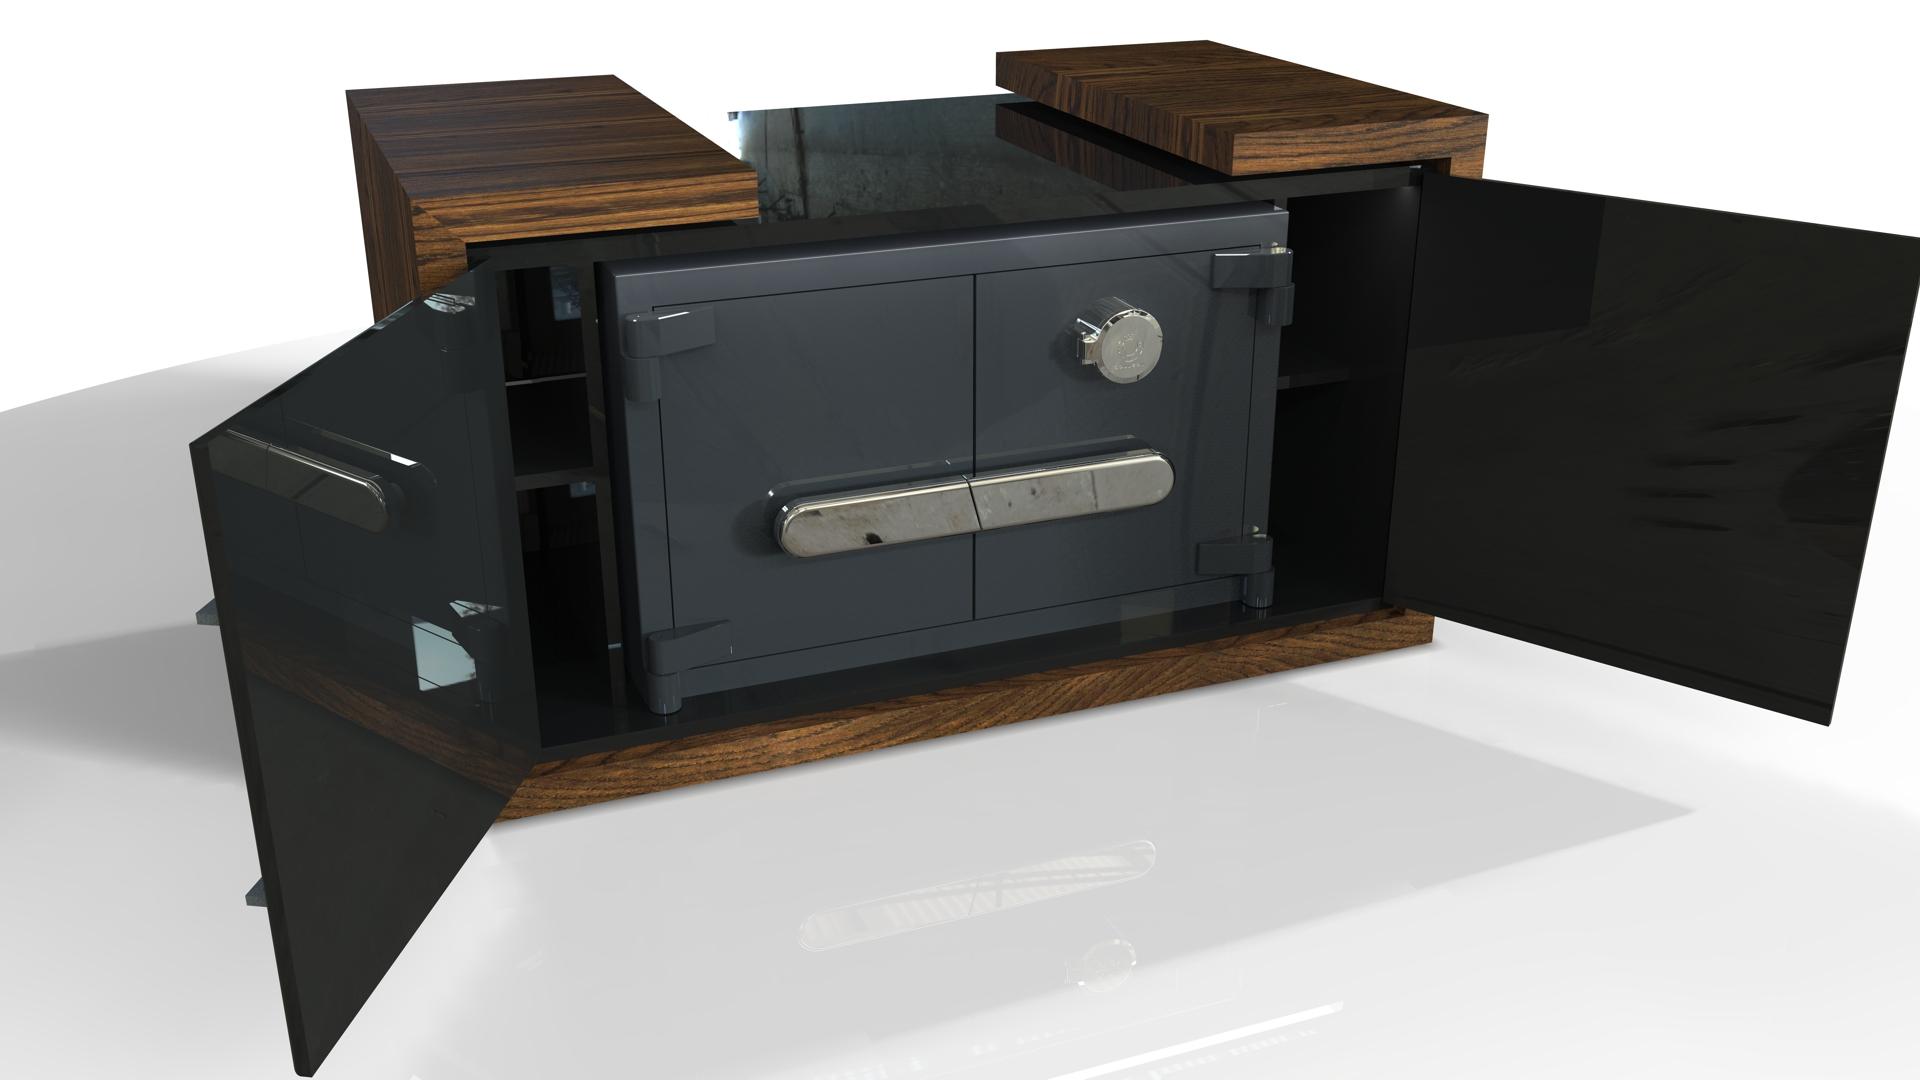 furniture v2locked.315.jpg